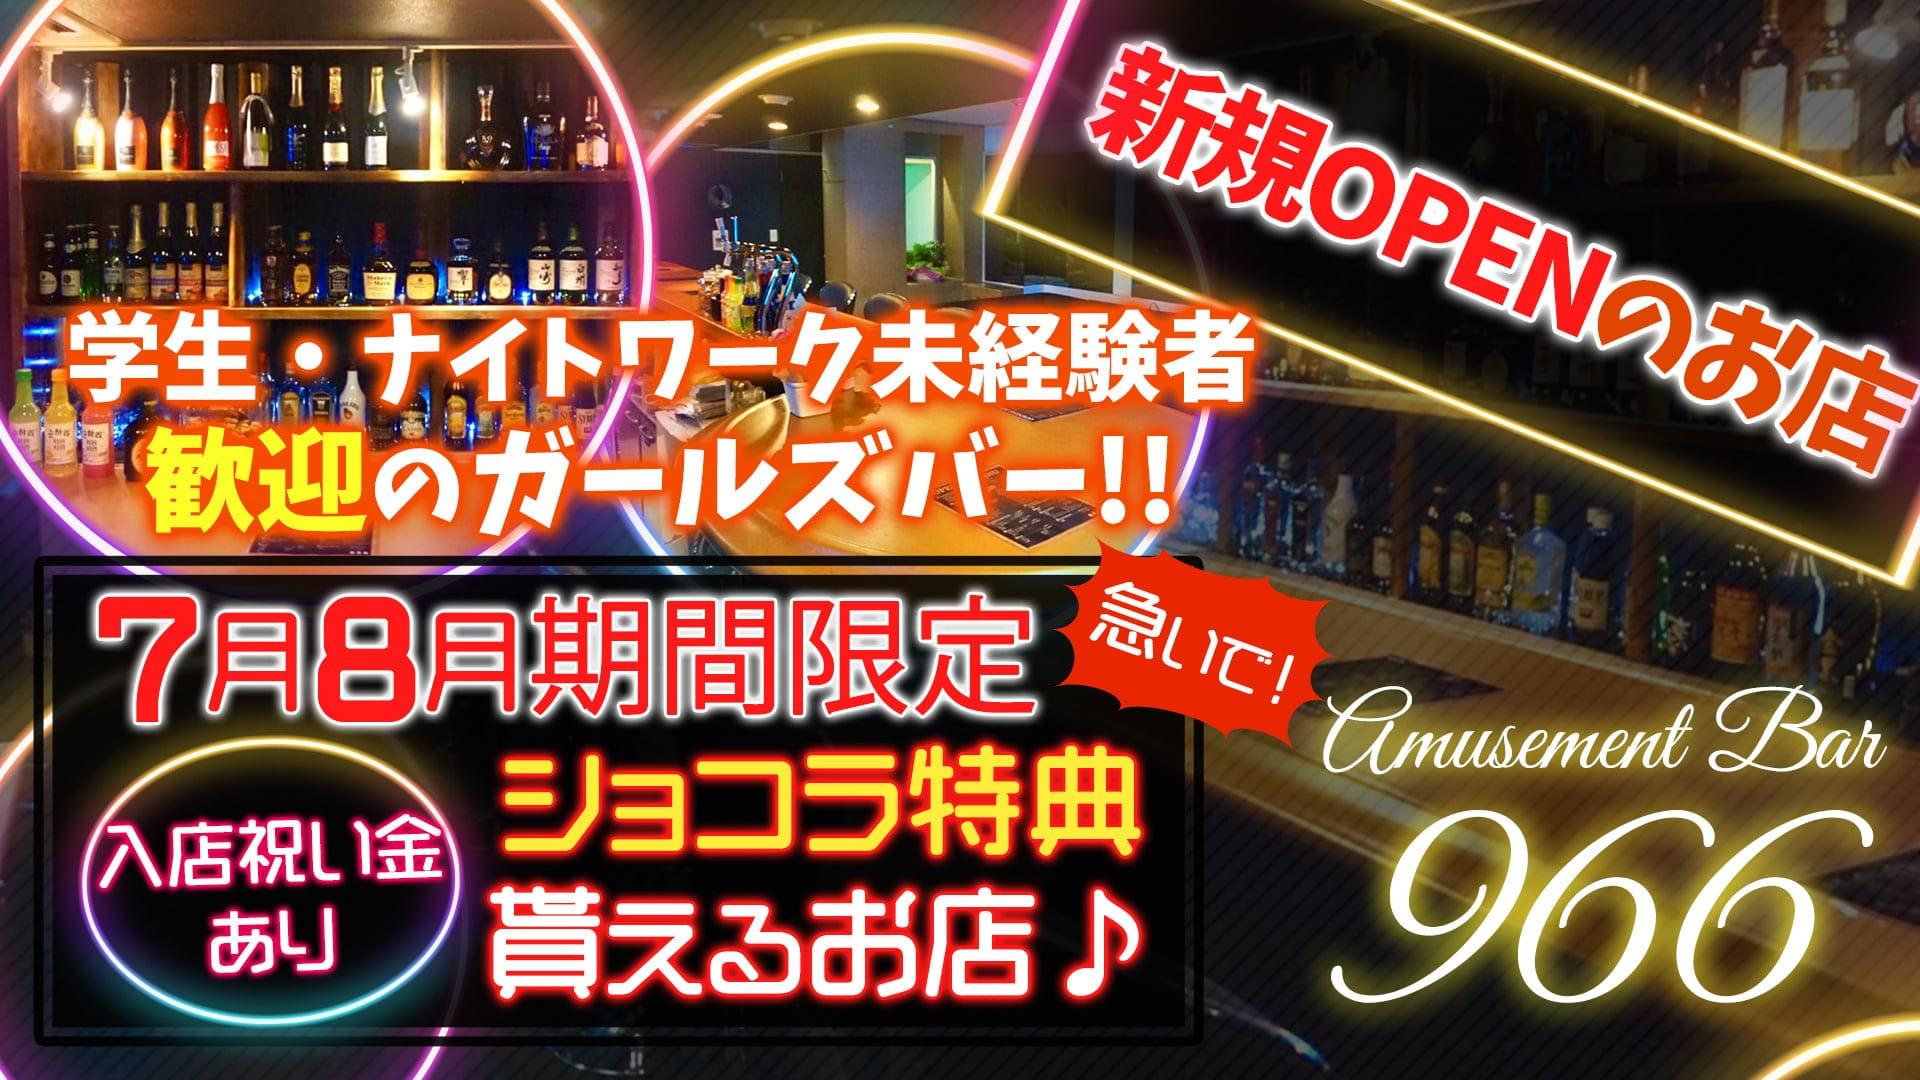 Amusement Bar 966(クロム)【公式求人・体入情報】 流川ガールズバー TOP画像